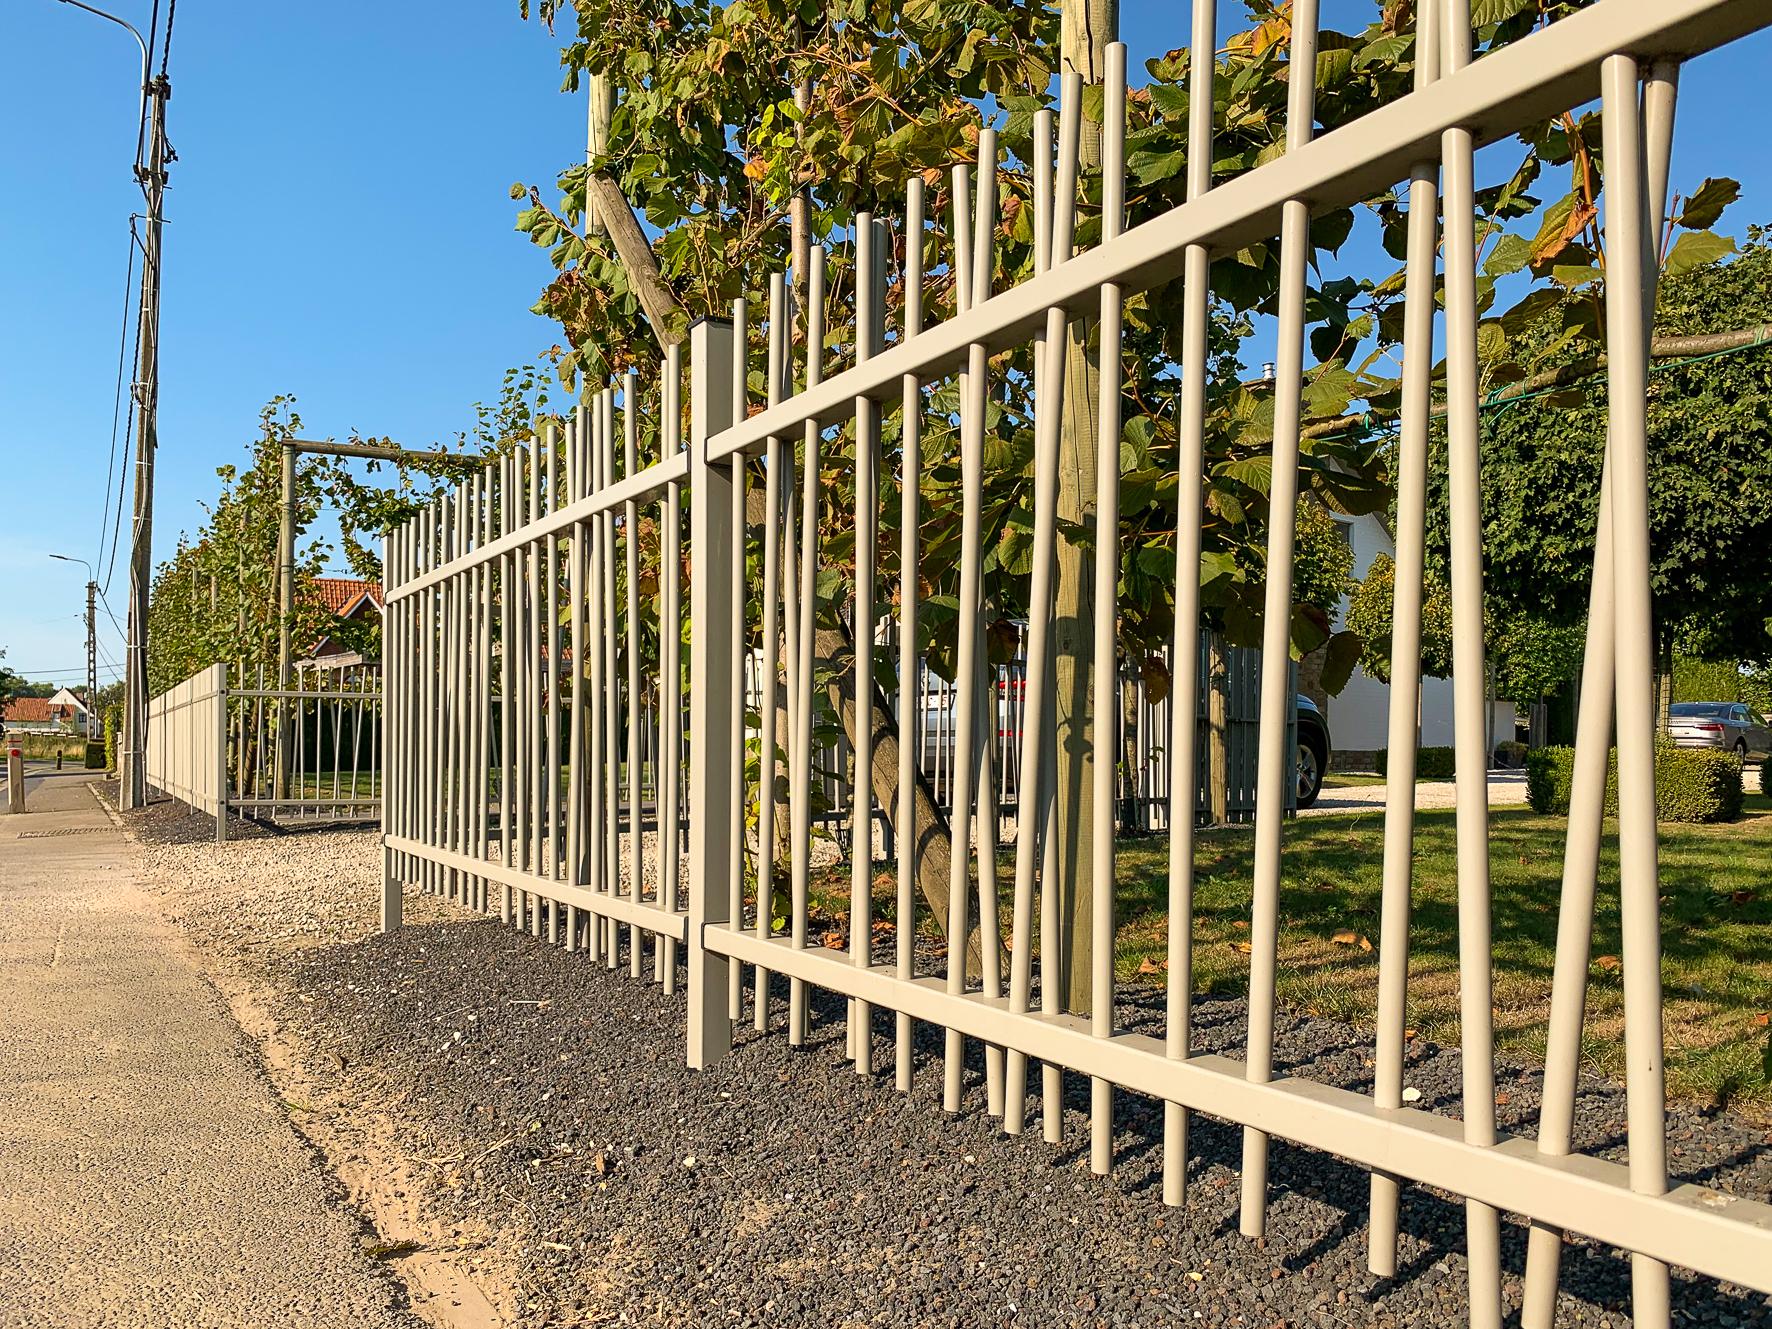 Jungle fence